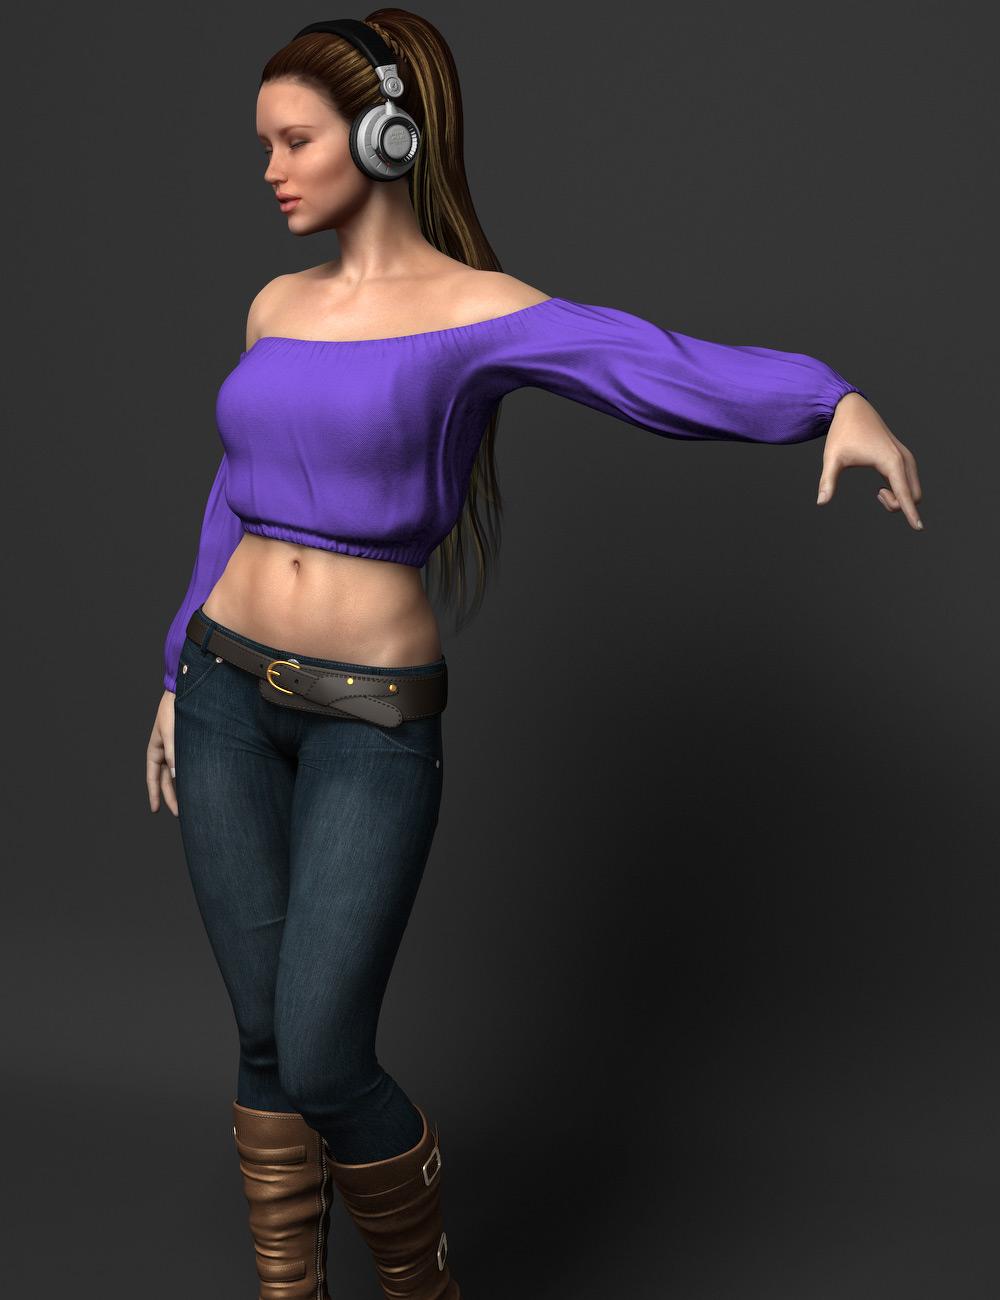 DJ Remixed by: zoro_d, 3D Models by Daz 3D